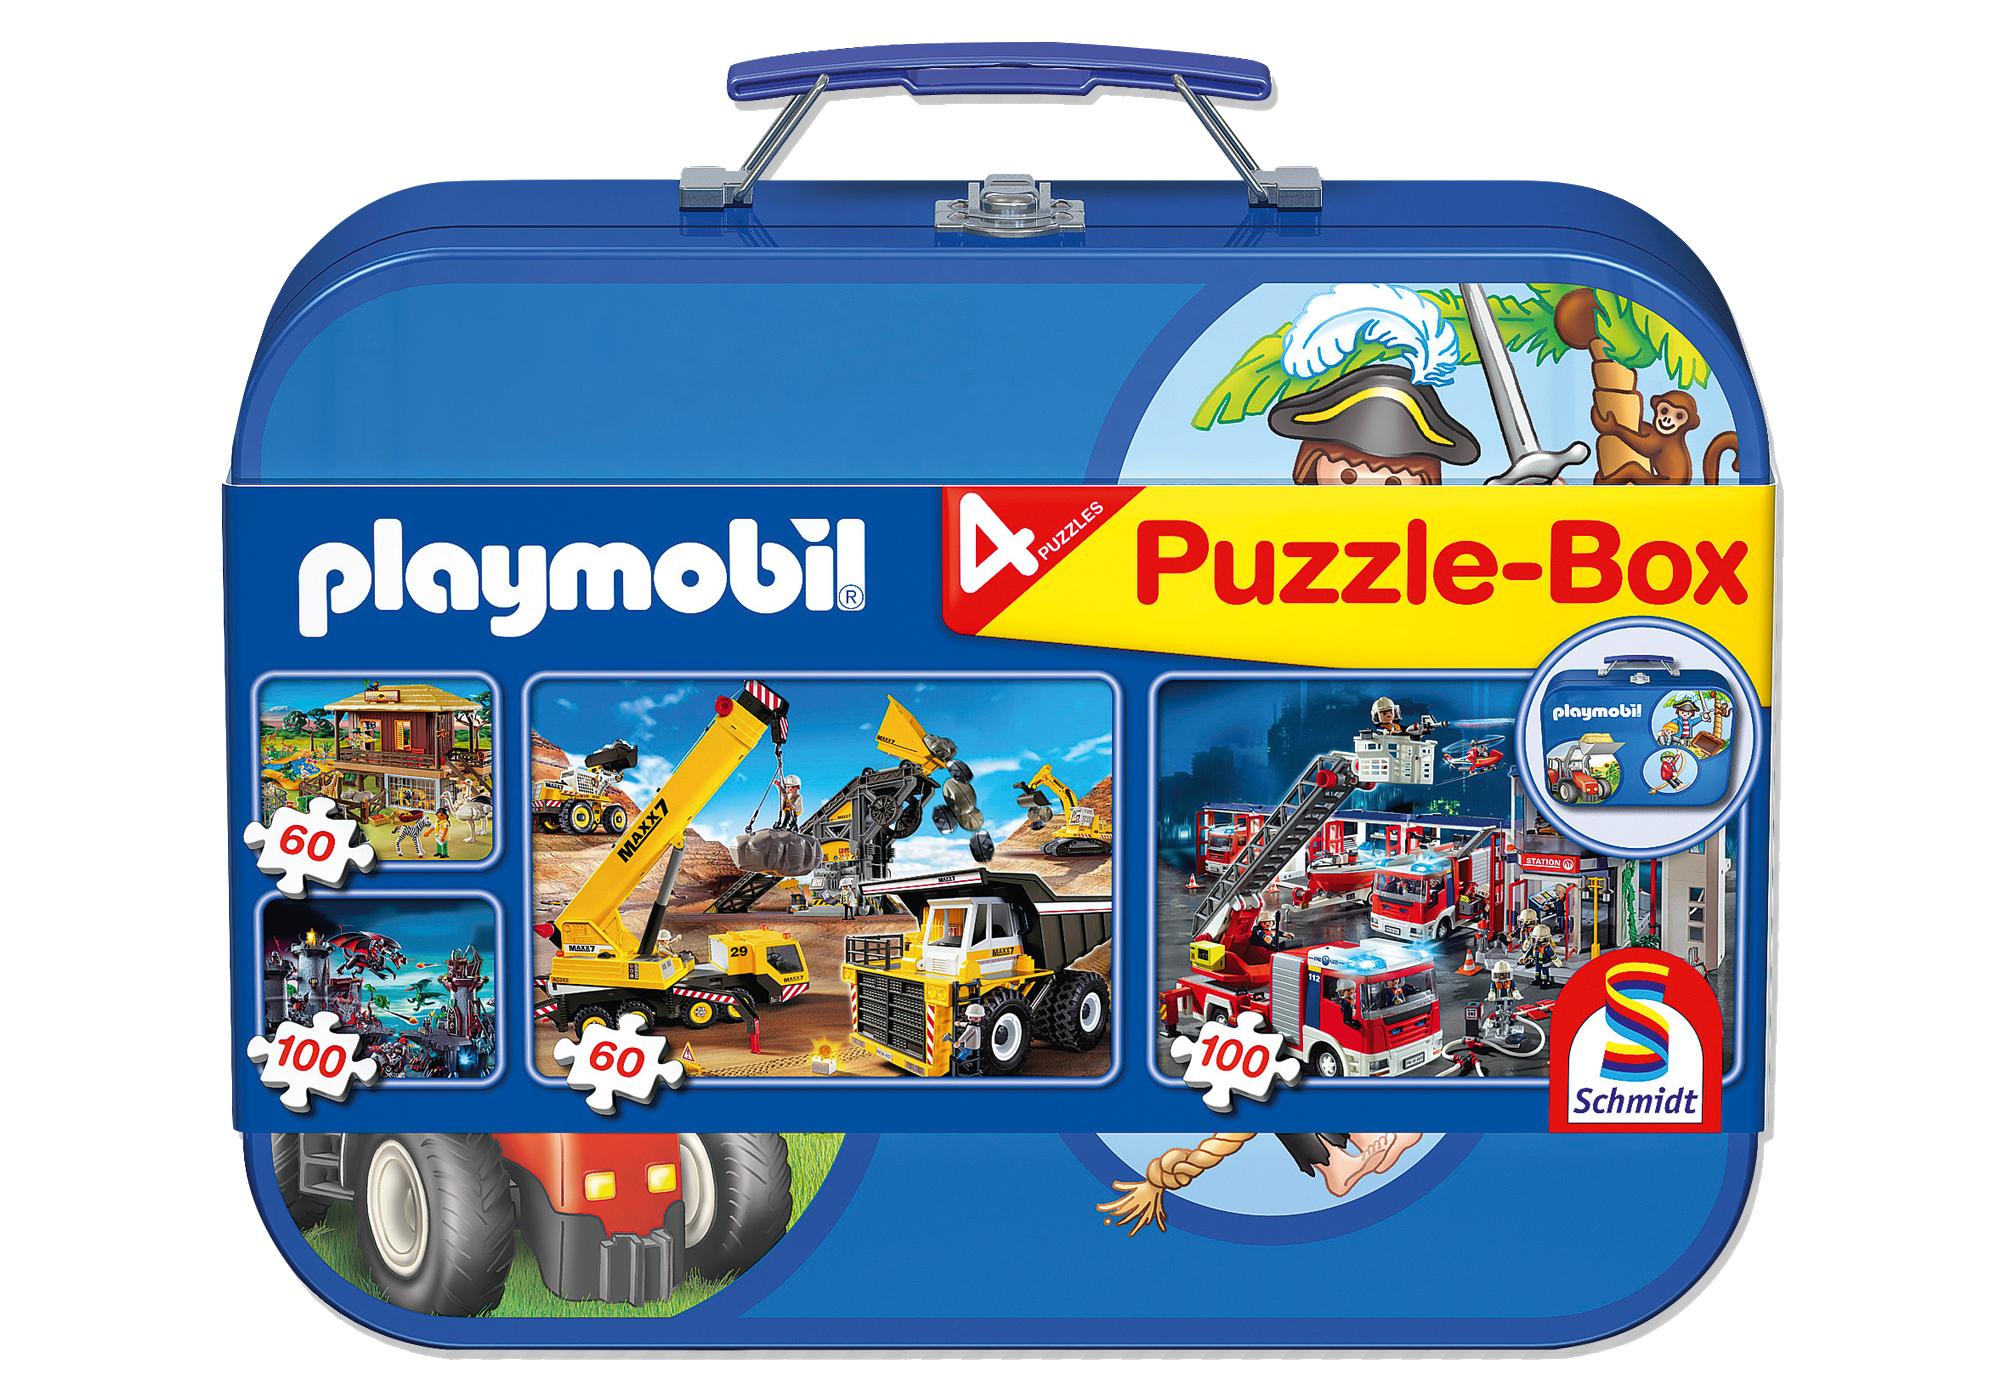 http://media.playmobil.com/i/playmobil/80247_product_detail/Puzzelkoffer - vier in één